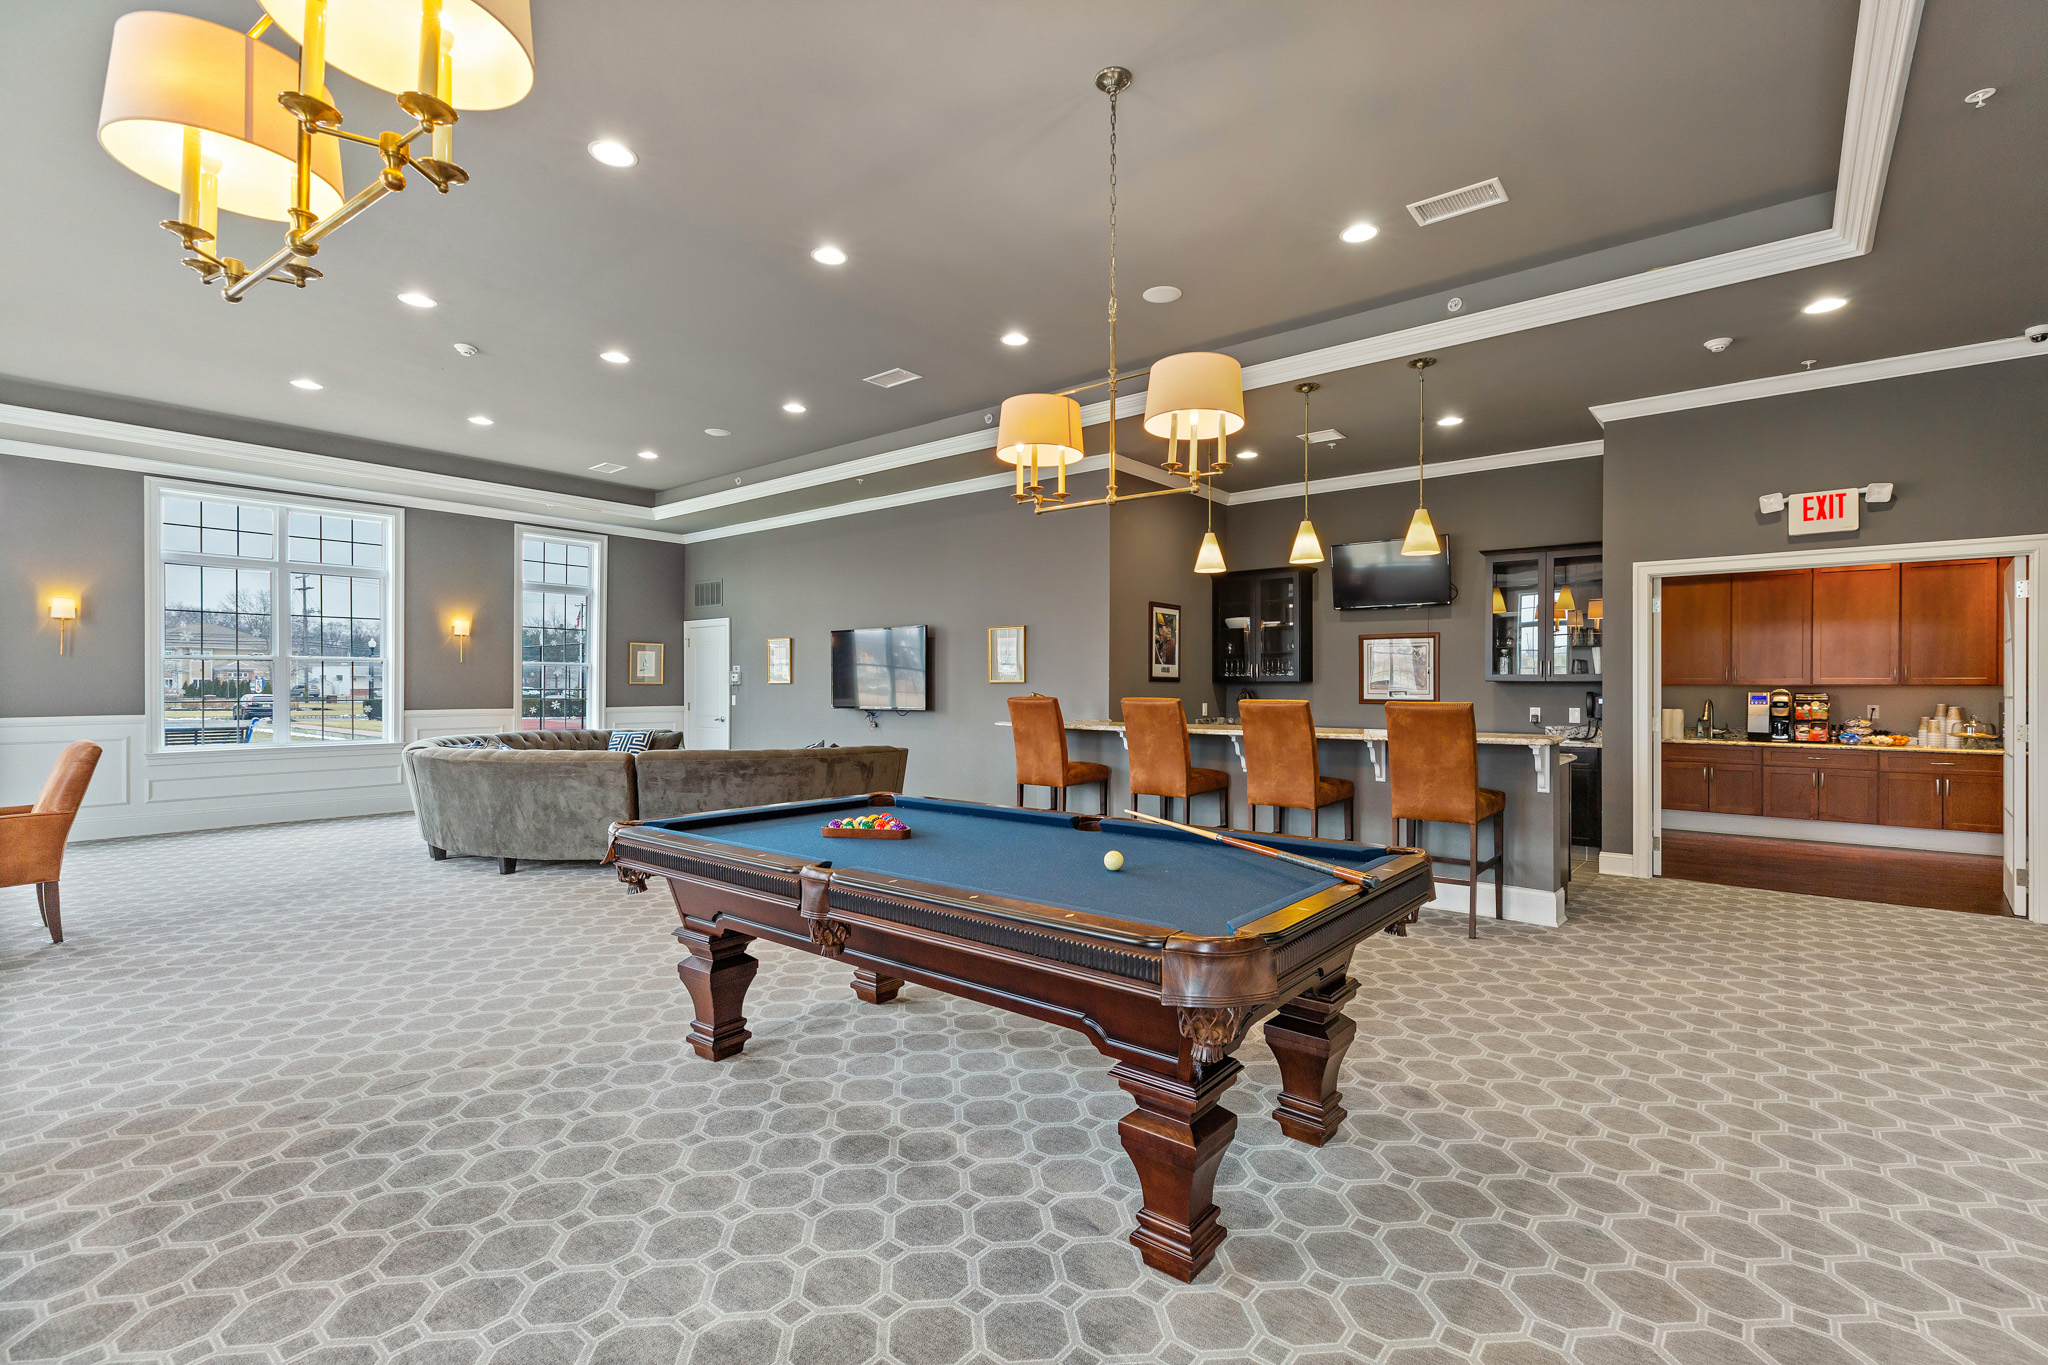 Sports Lounge facing pool table.jpg